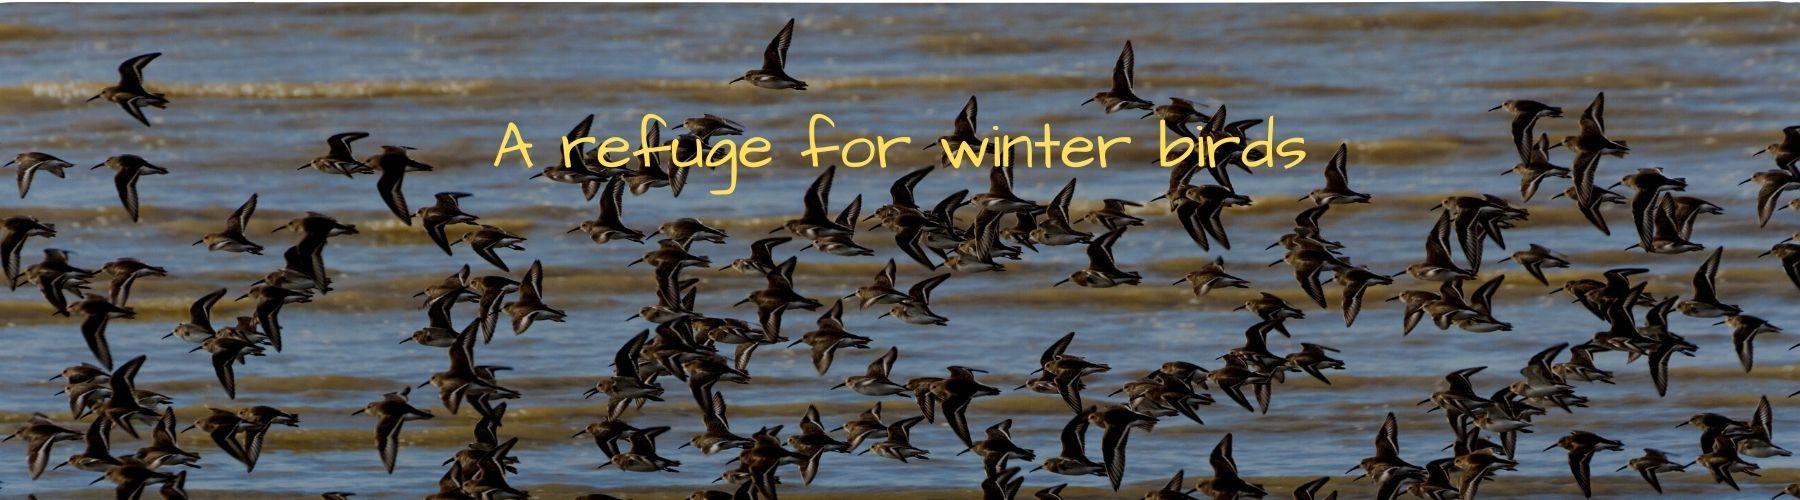 header salt marsh winter